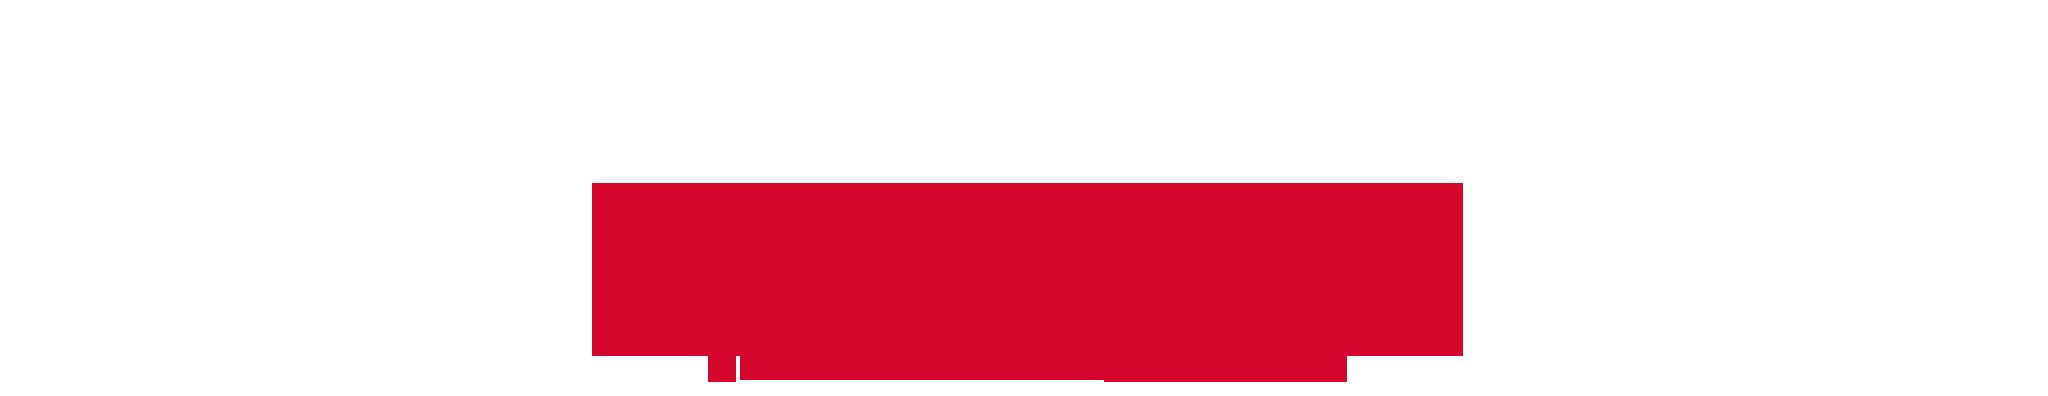 2048-396-tab-sp